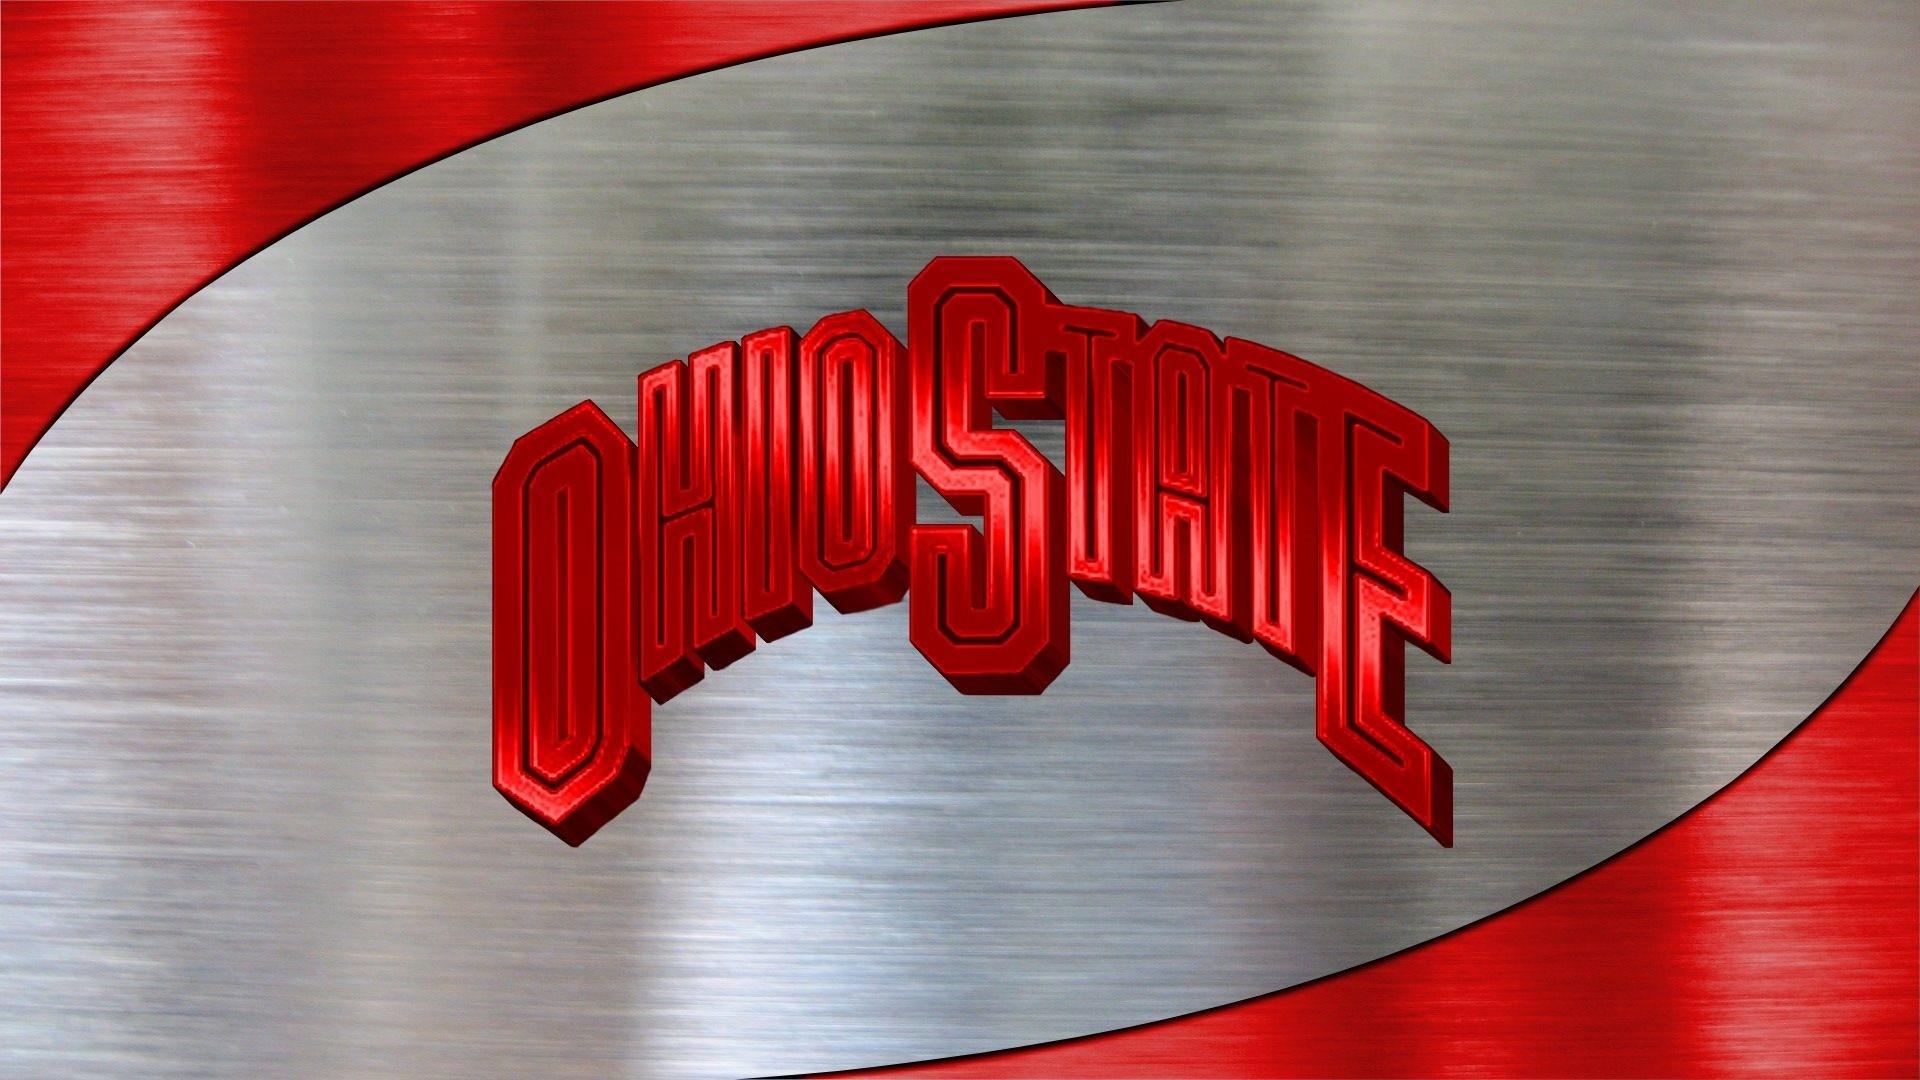 Ohio State Wallpaper image hd